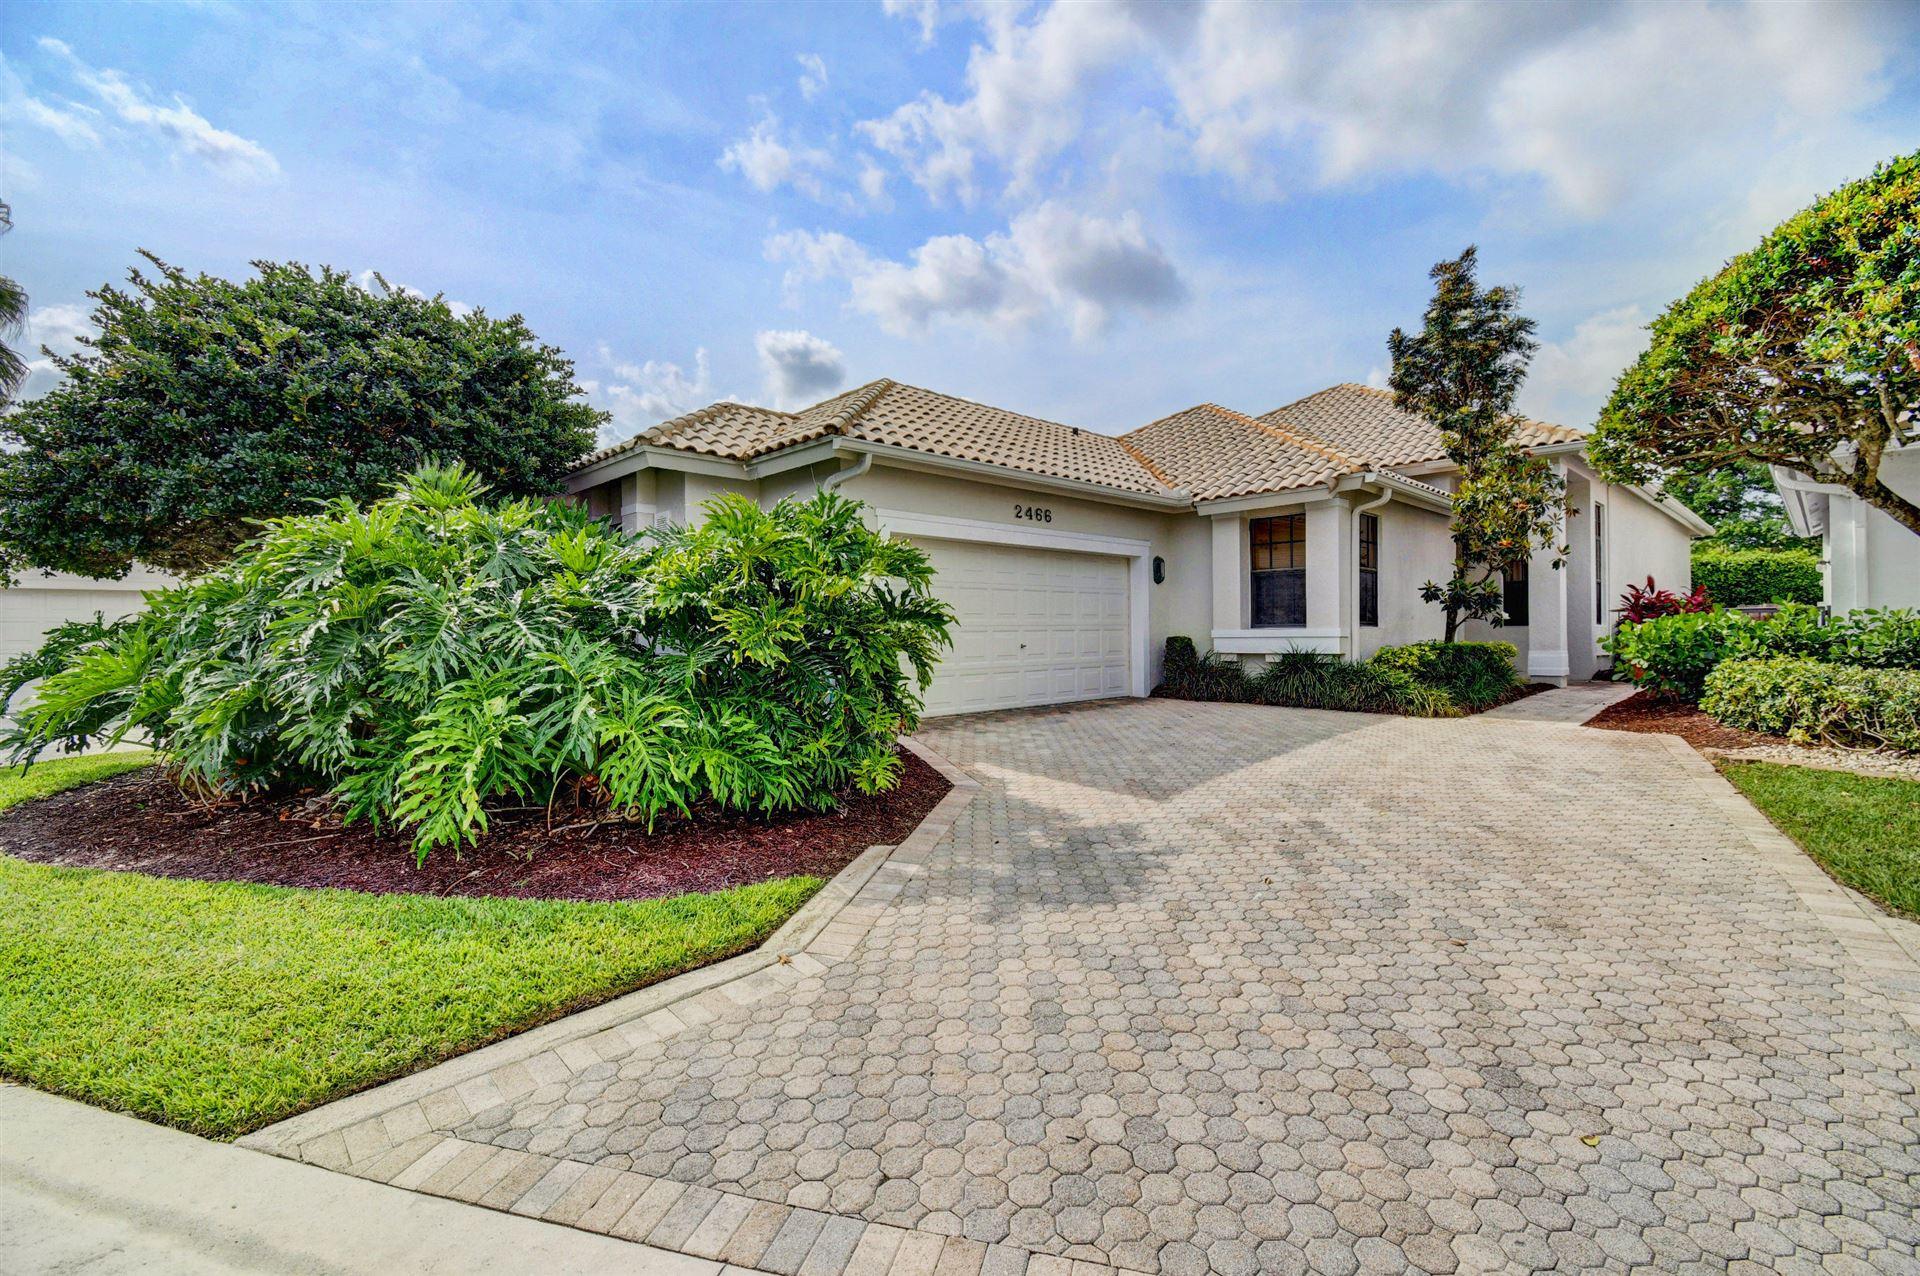 2466 NW 63rd Street, Boca Raton, FL 33496 - #: RX-10618686